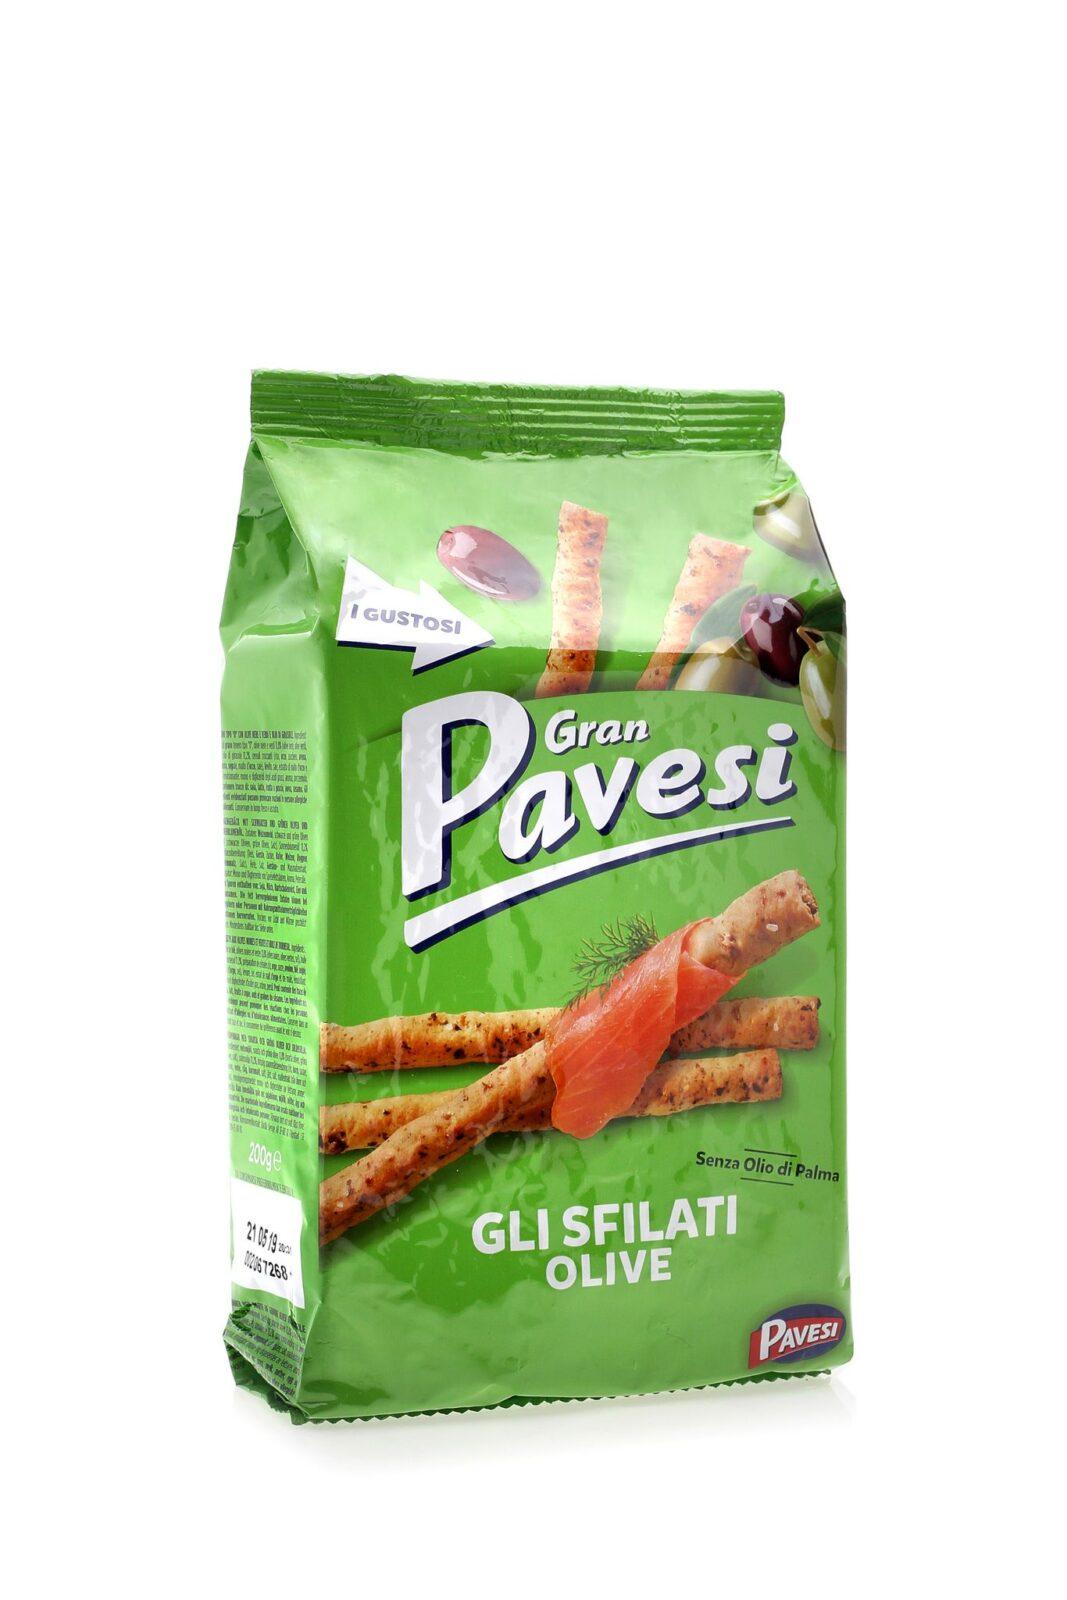 Gran Pavesi GRISSINI